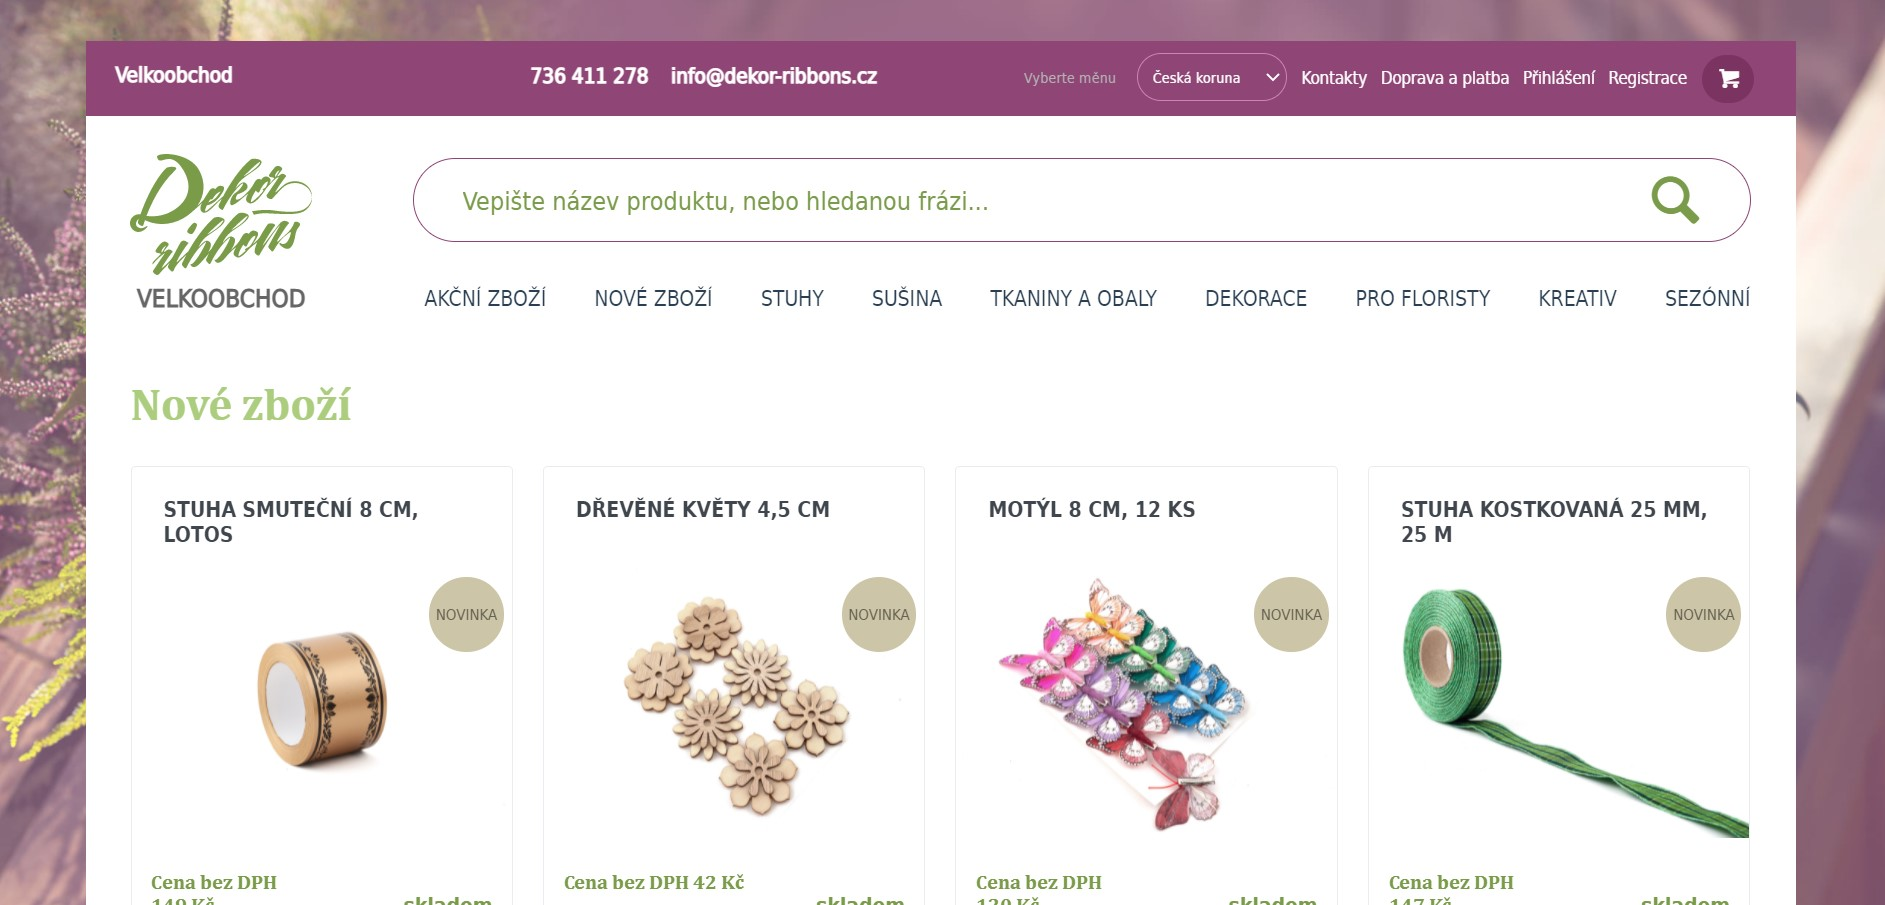 Dekor Ribbons s.r.o. - detail e-shopu